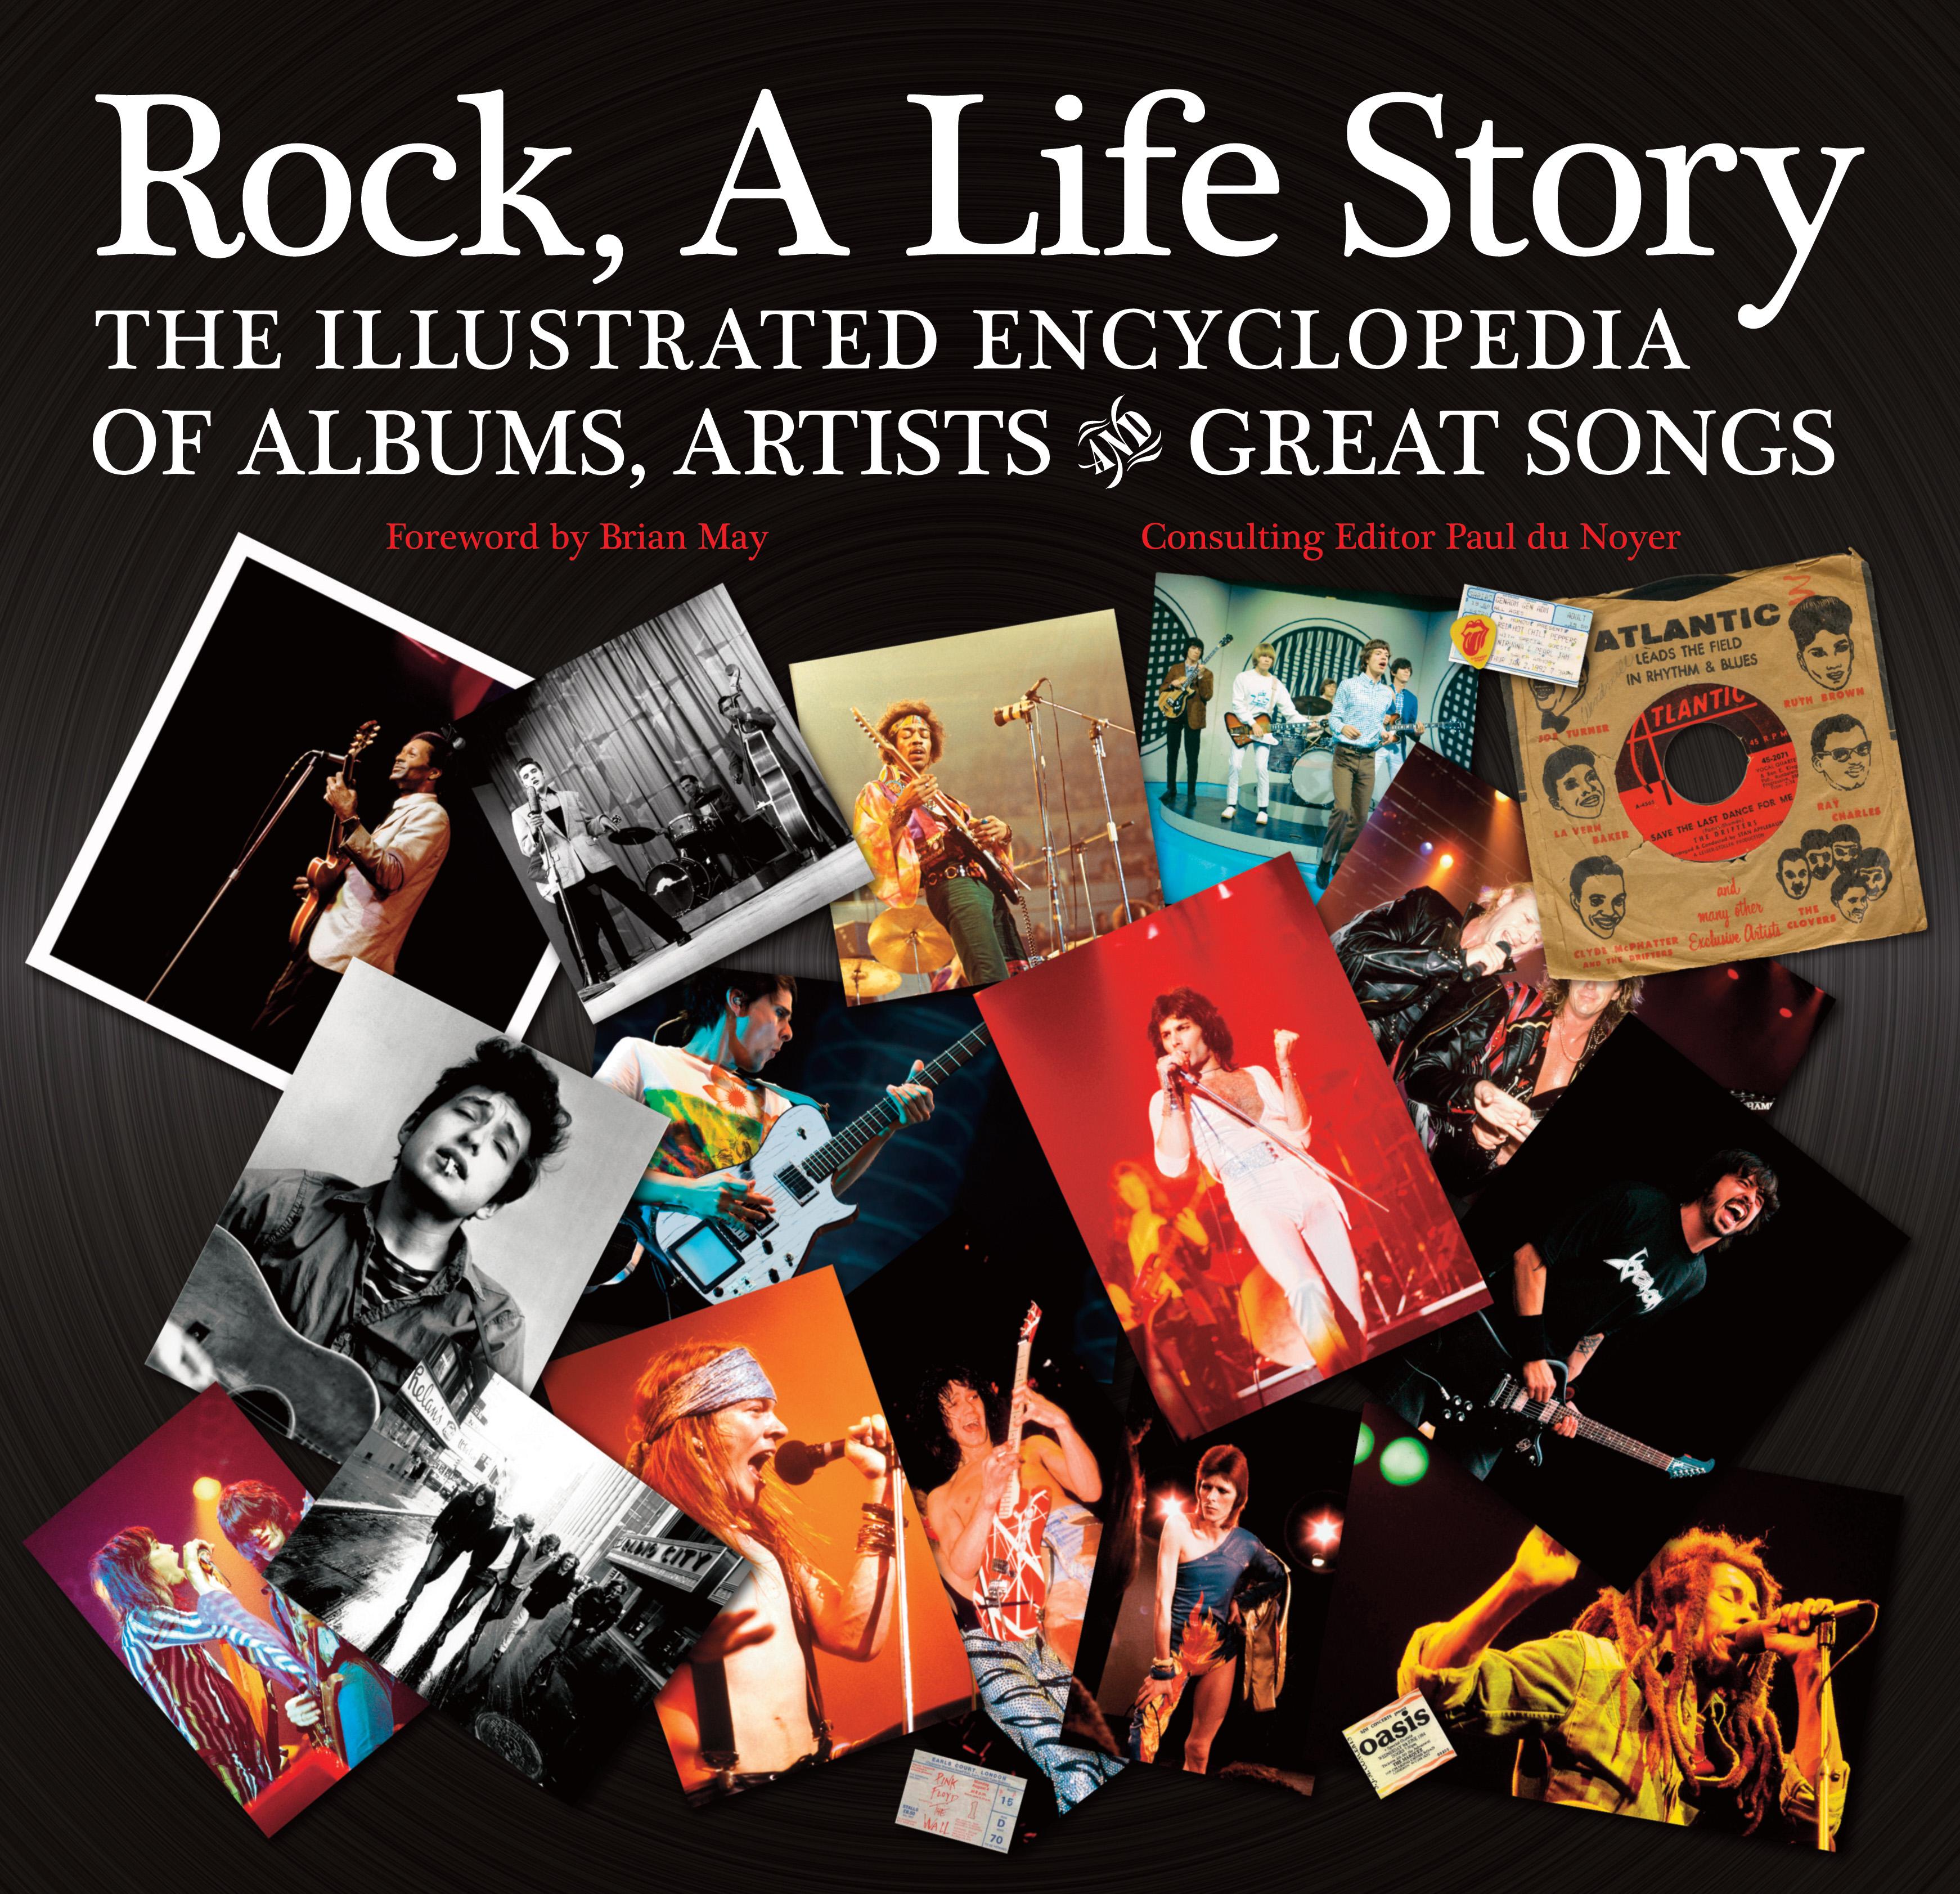 Rock, A Life Story; Flame Tree Publishing